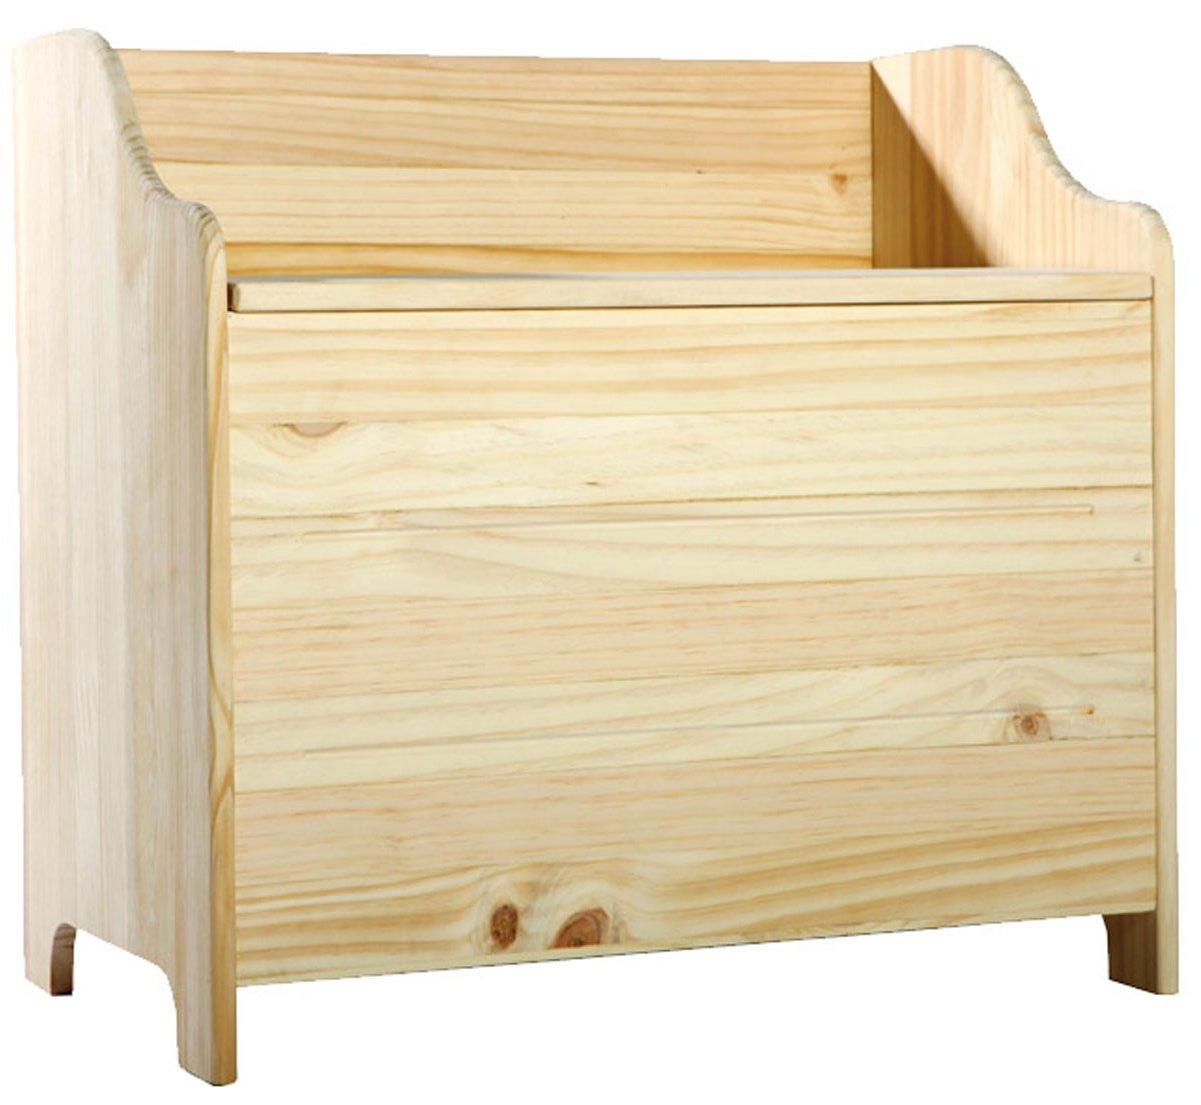 Natural Pine Storage Bench